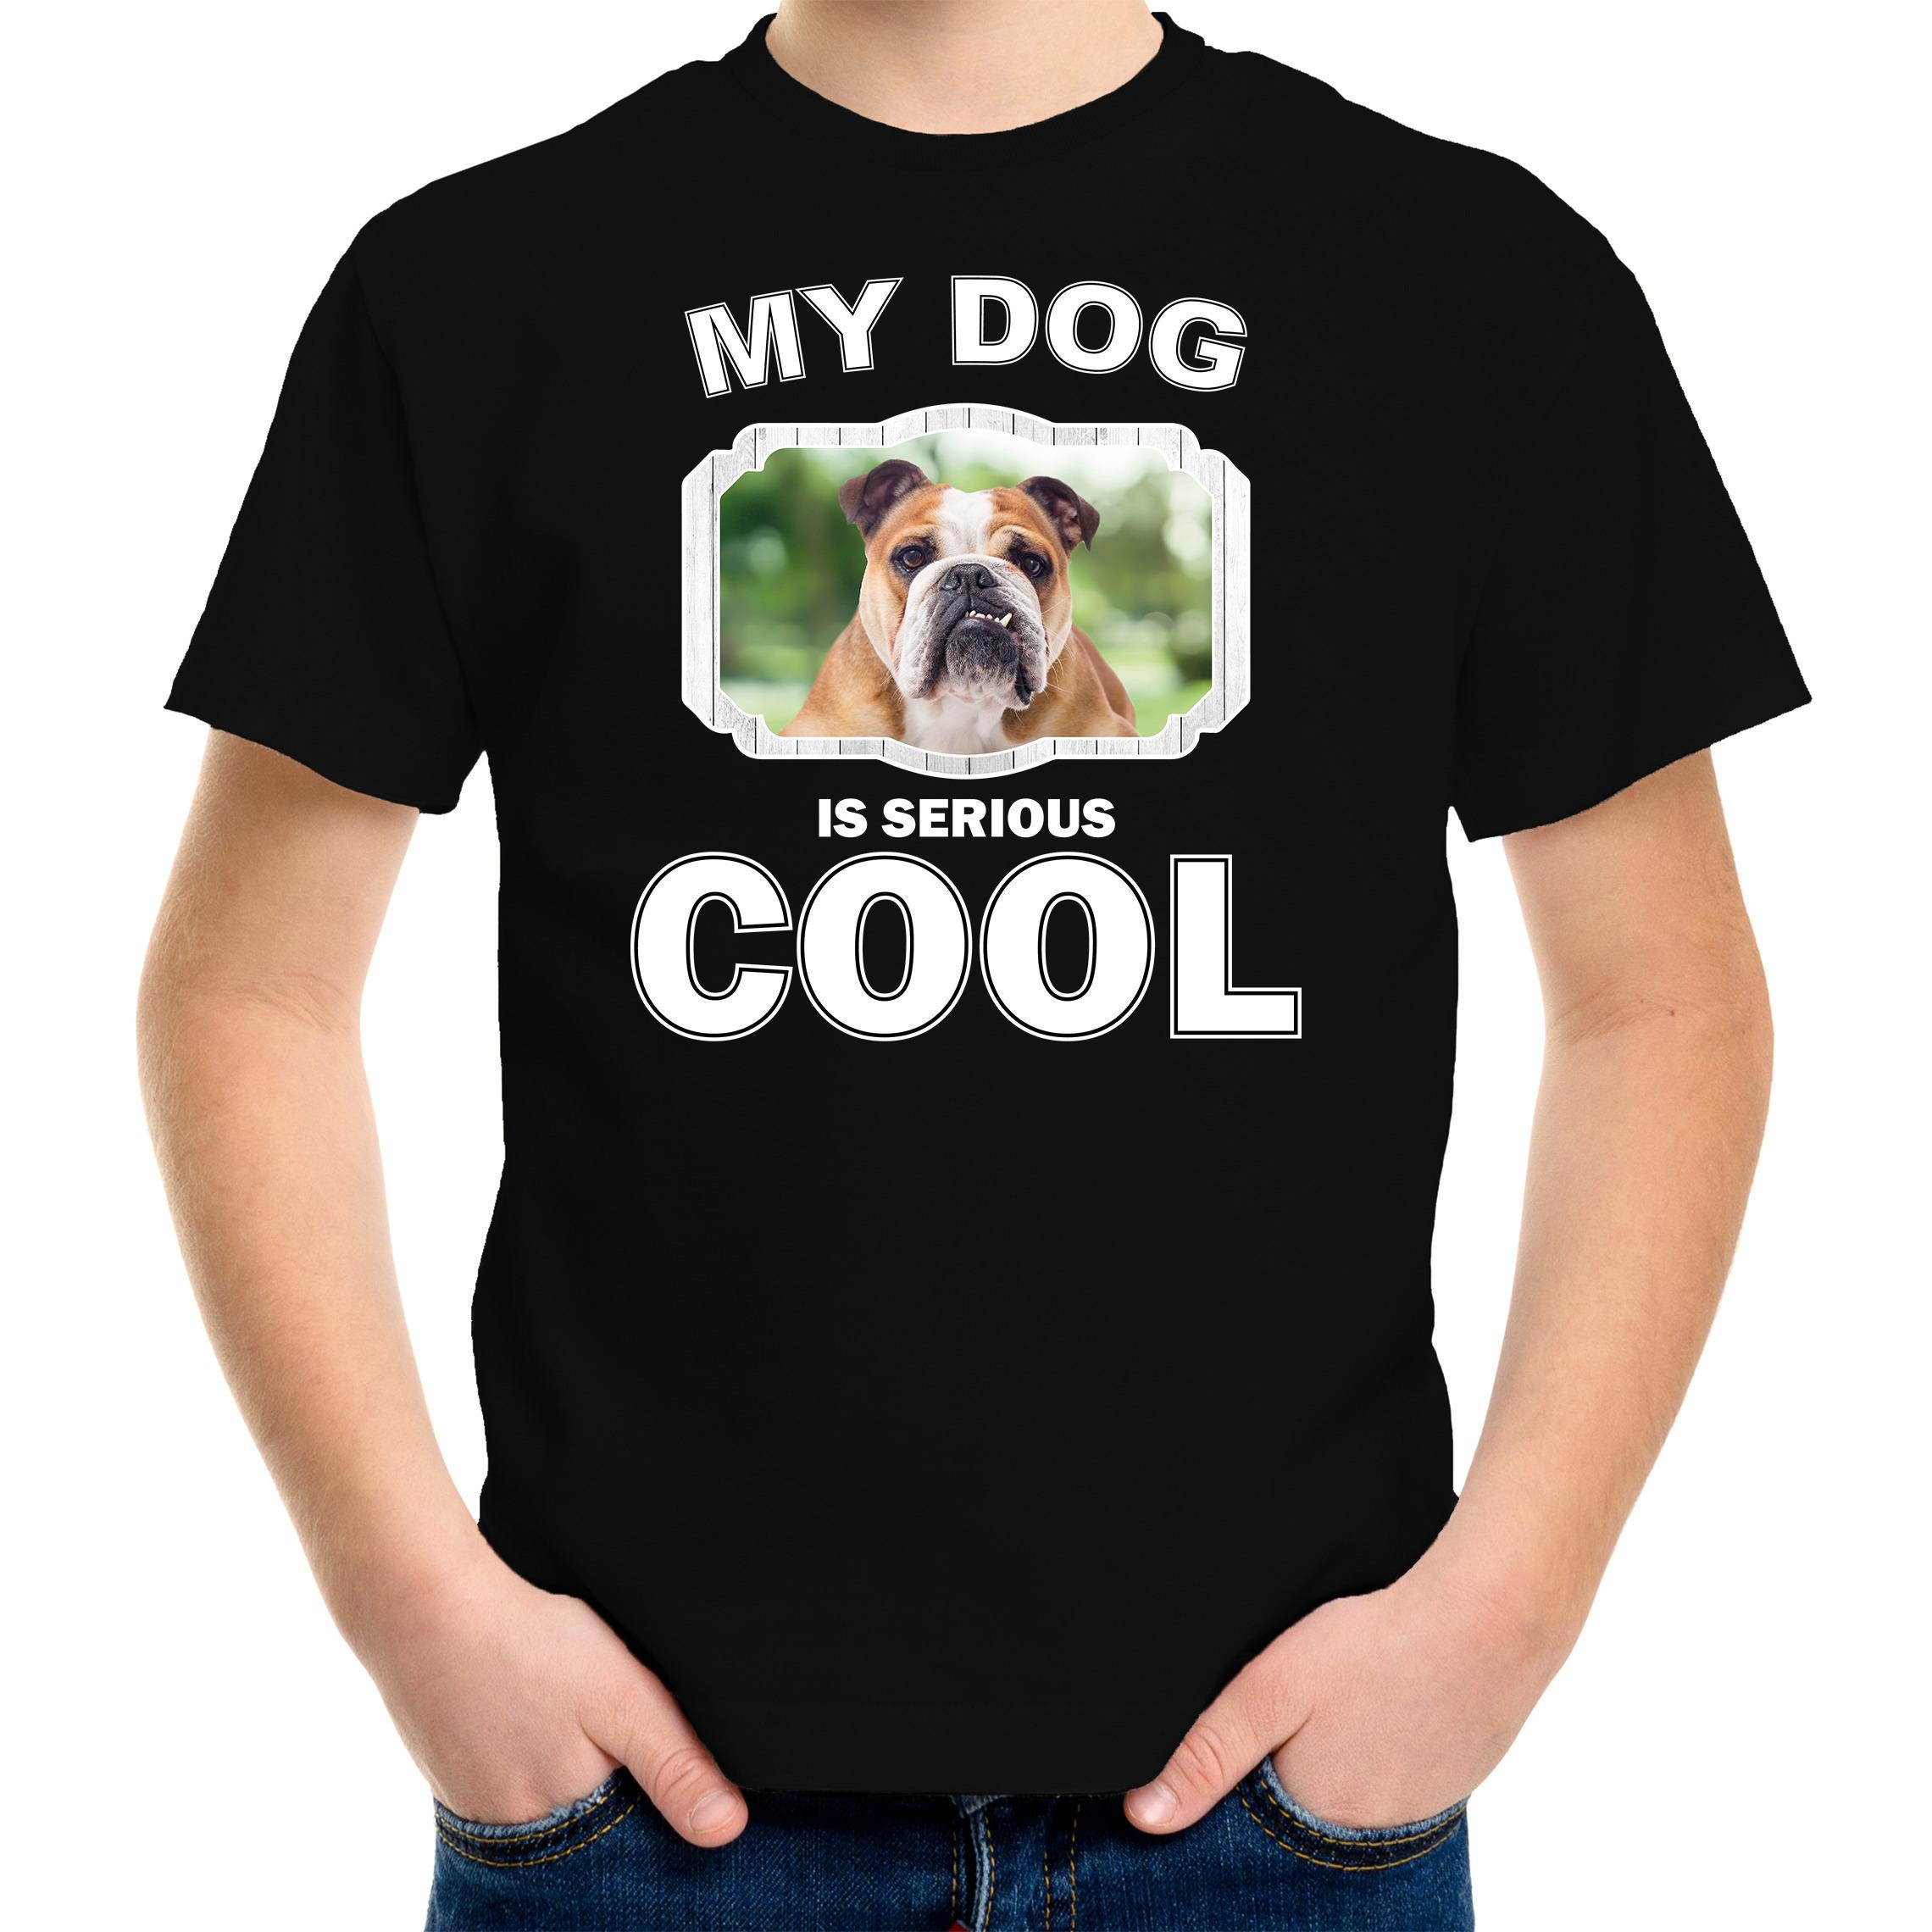 Honden liefhebber shirt Engelse bulldog my dog is serious cool zwart voor kinderen